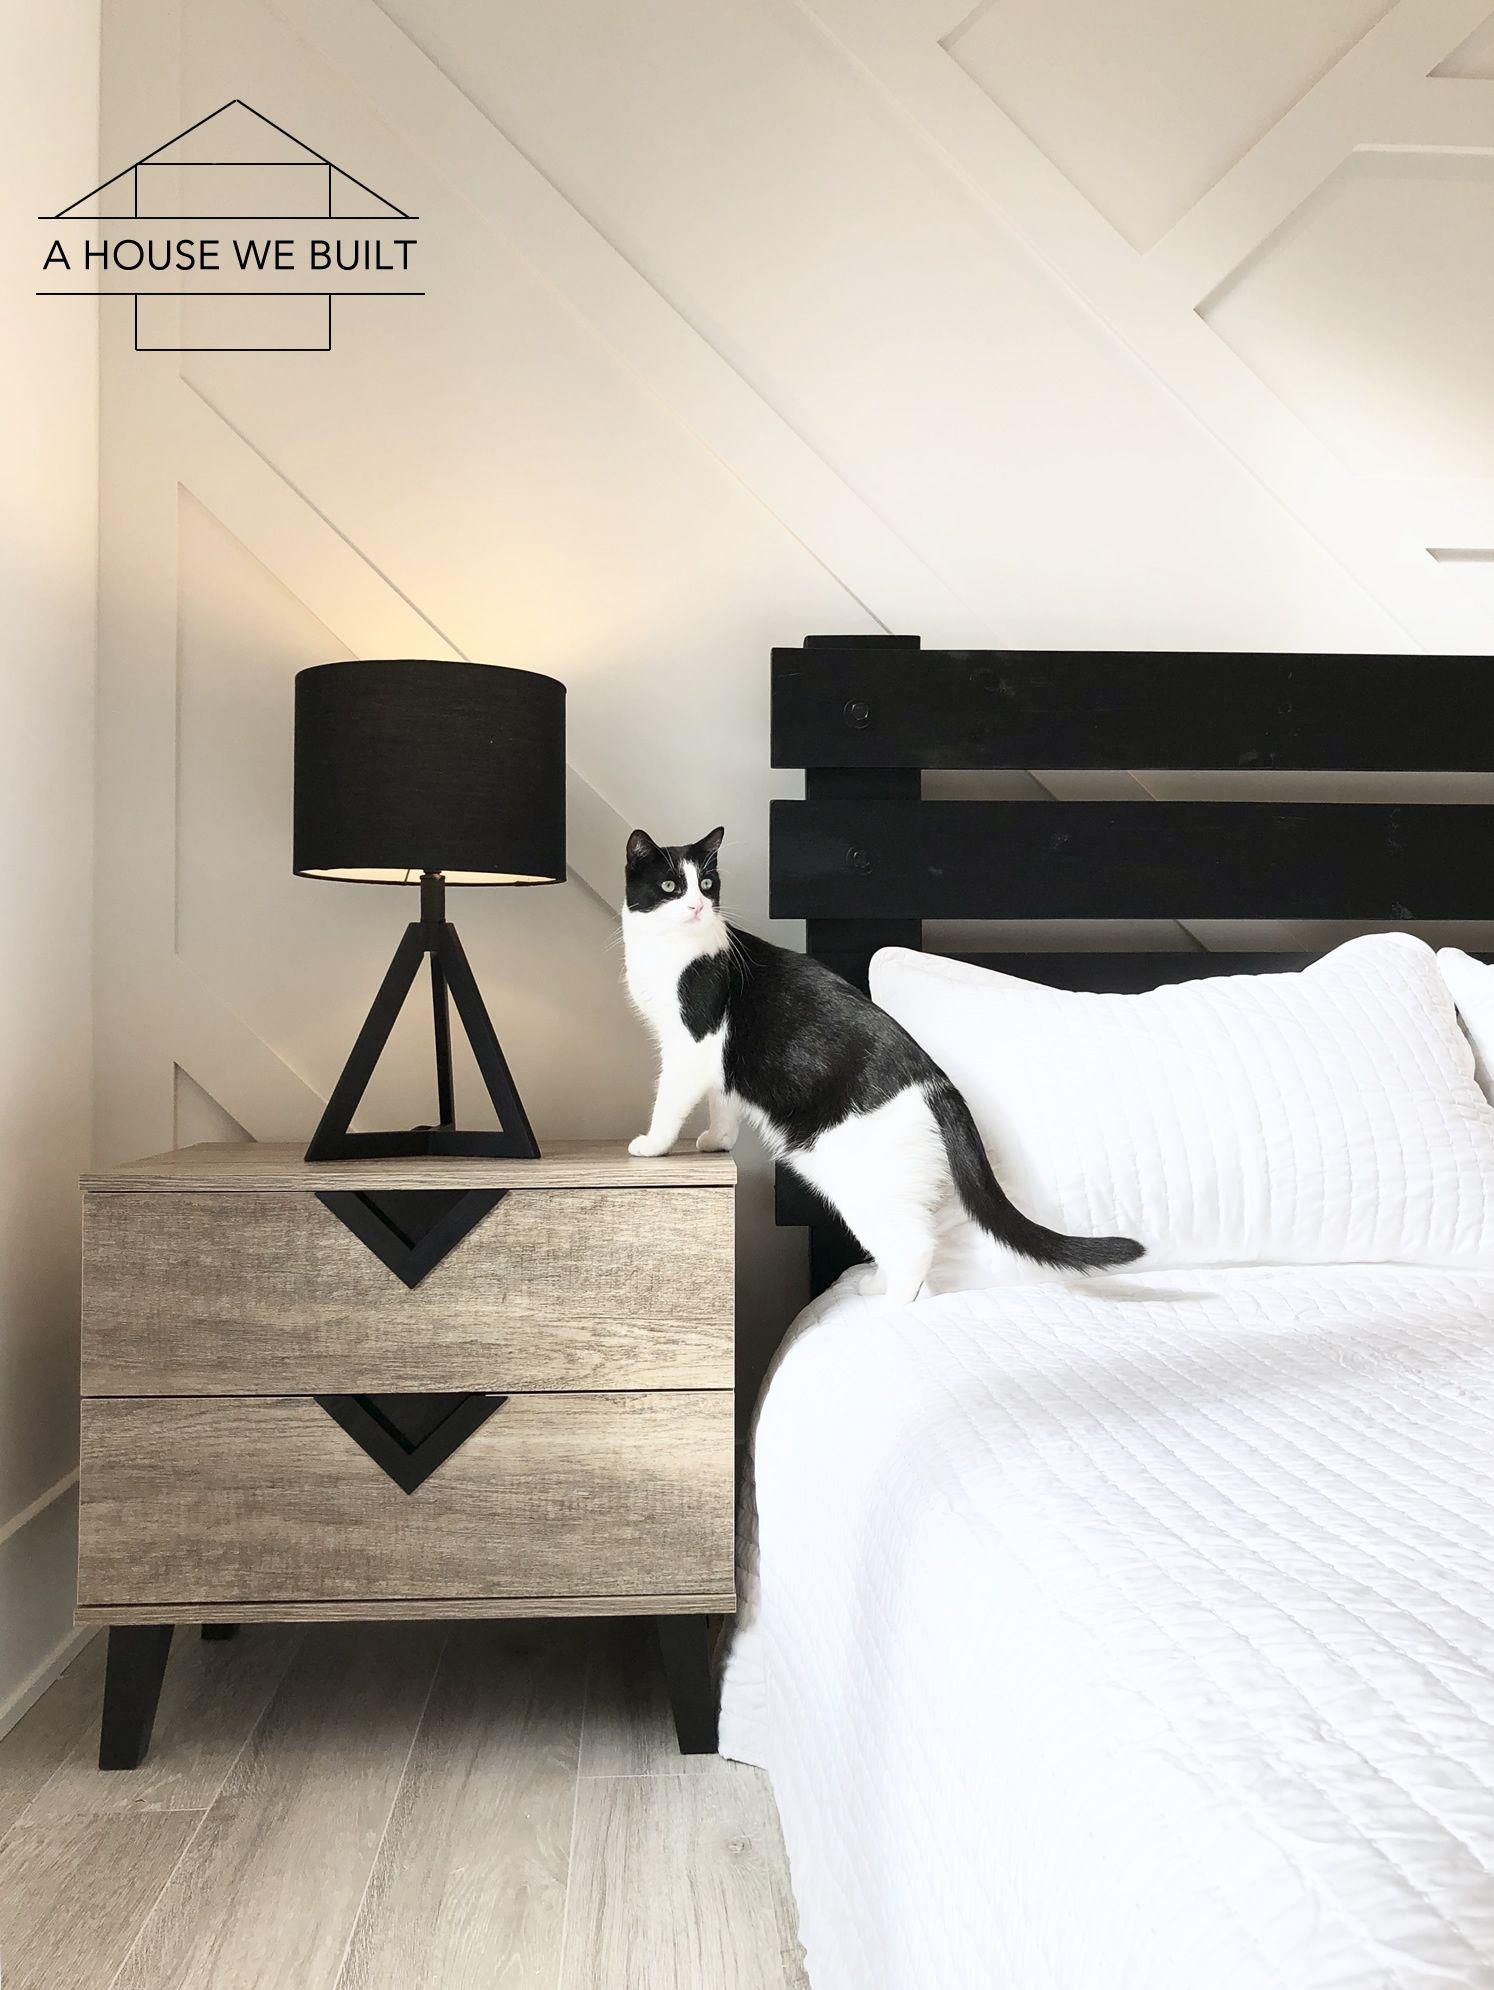 8x8 Bedroom Design: Custom House Designed By Husband & Wife